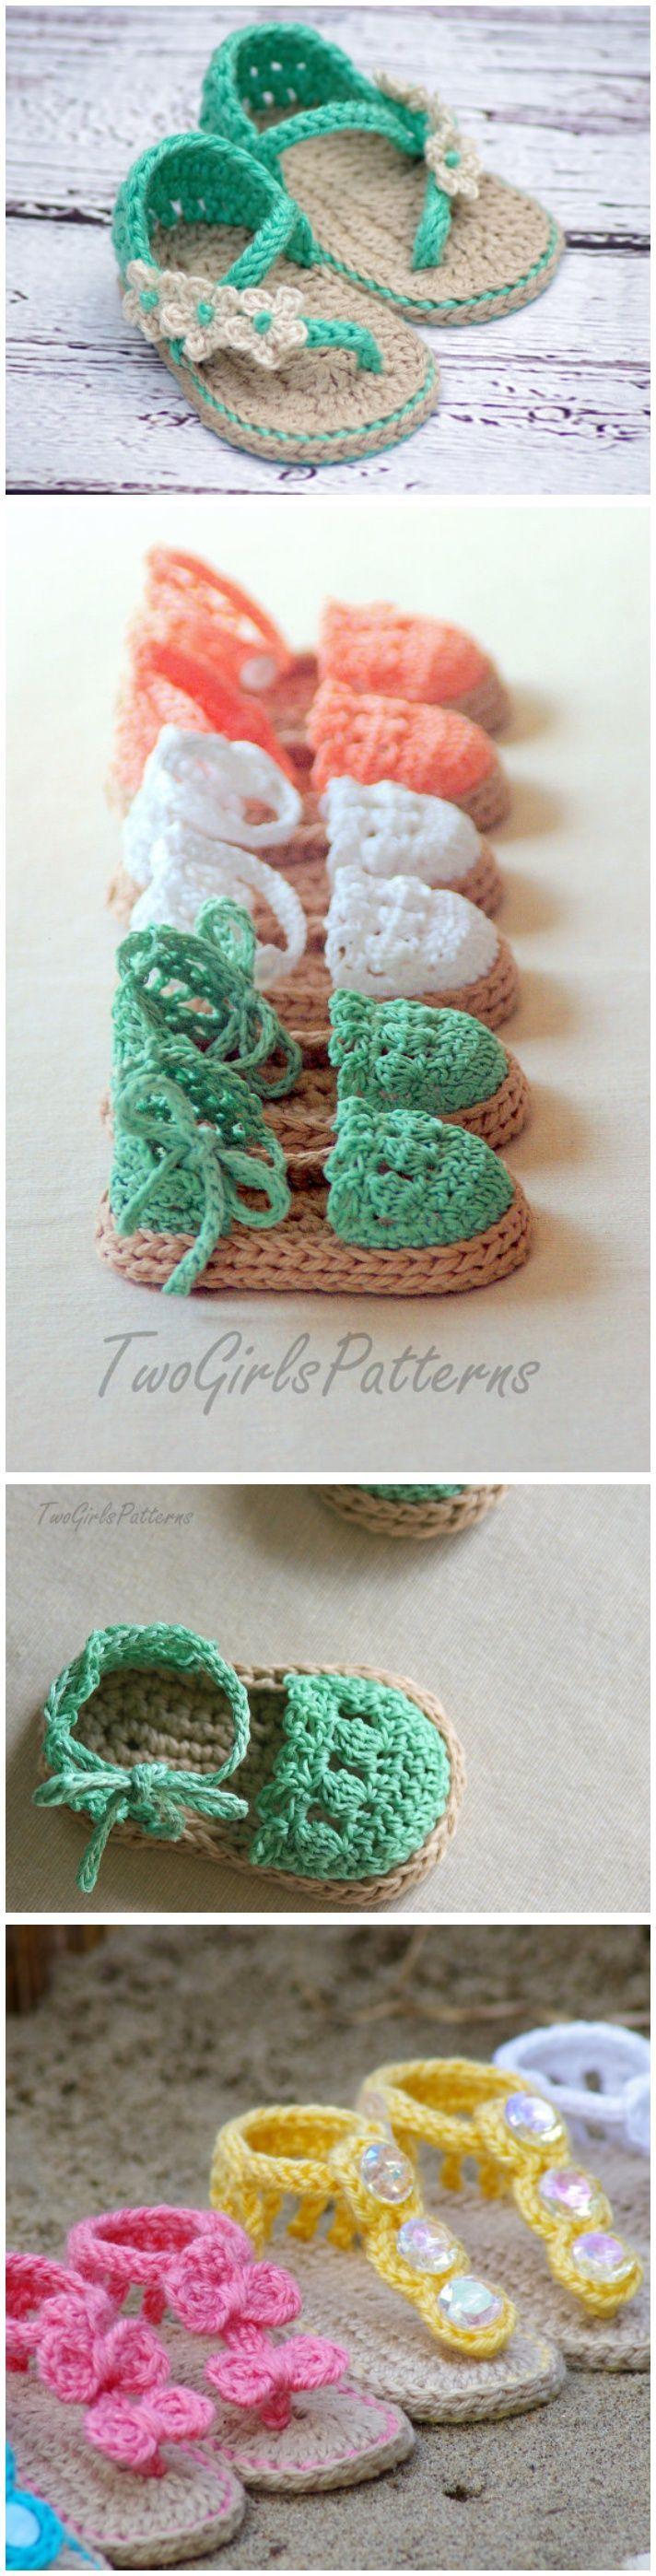 Crochet Baby Booties Crochet Baby Flip Flop Sandals with Patterns ...